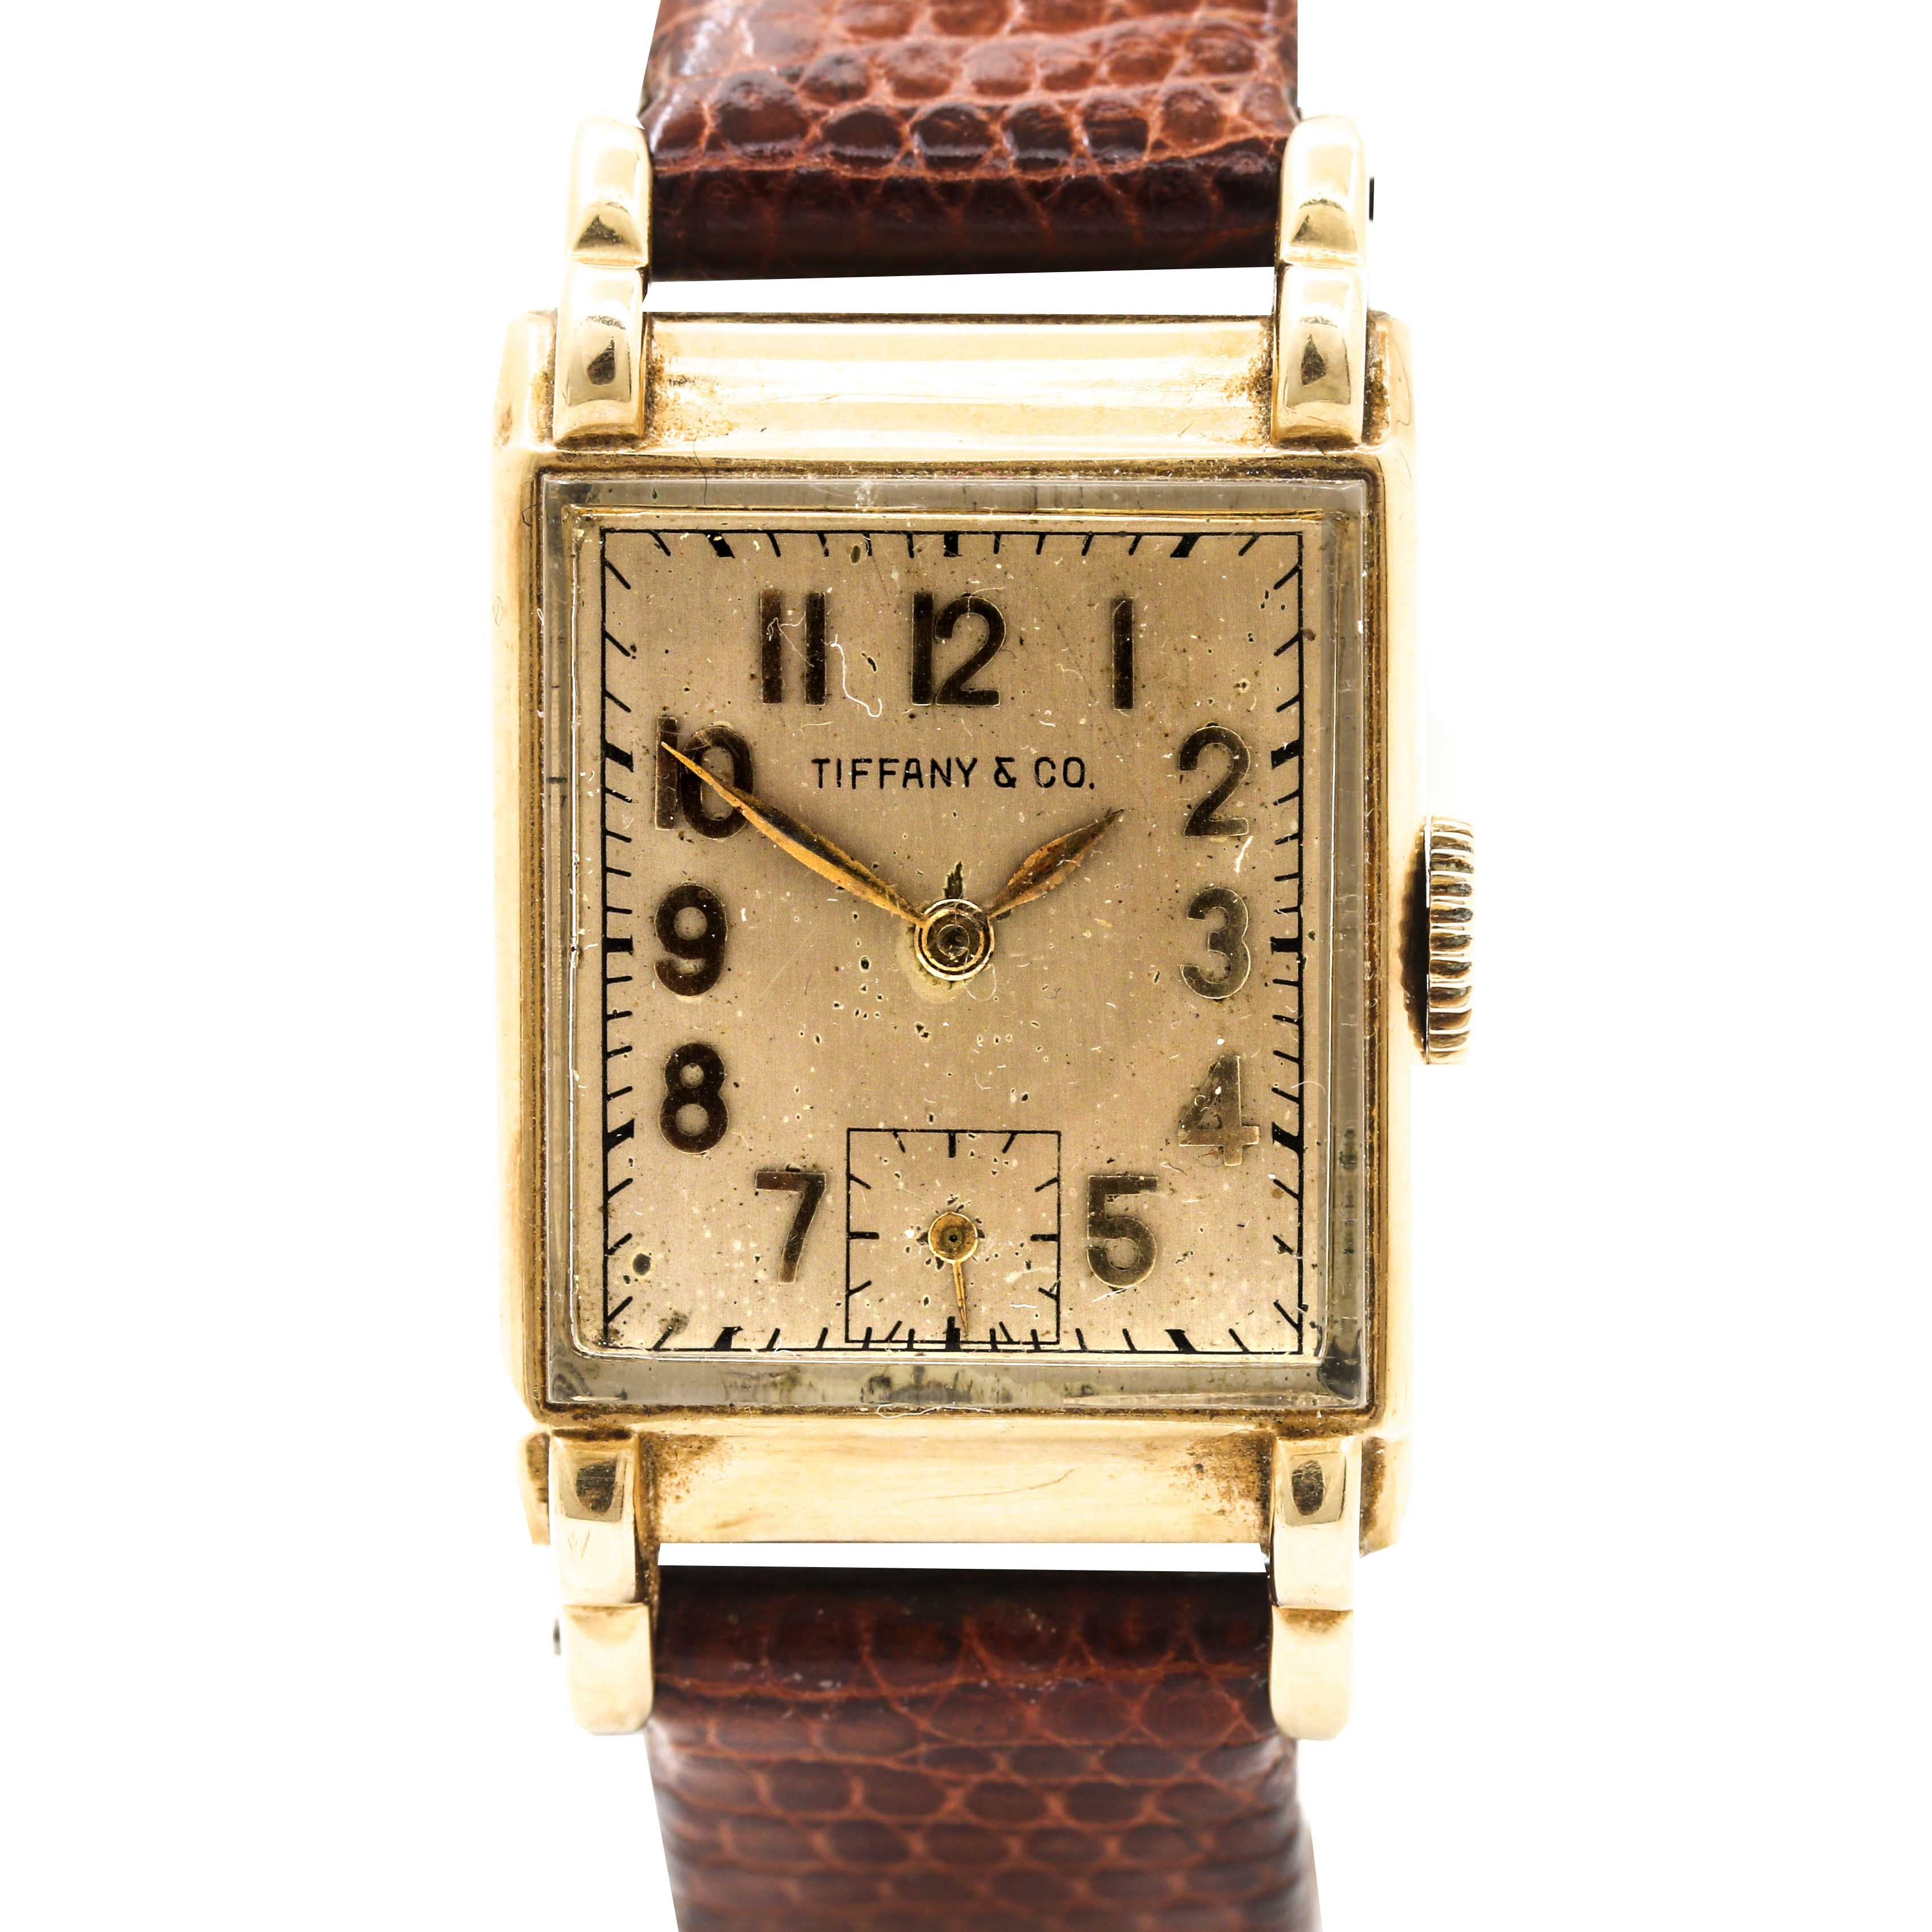 Tiffany & Co. 14K Yellow Gold Wristwatch